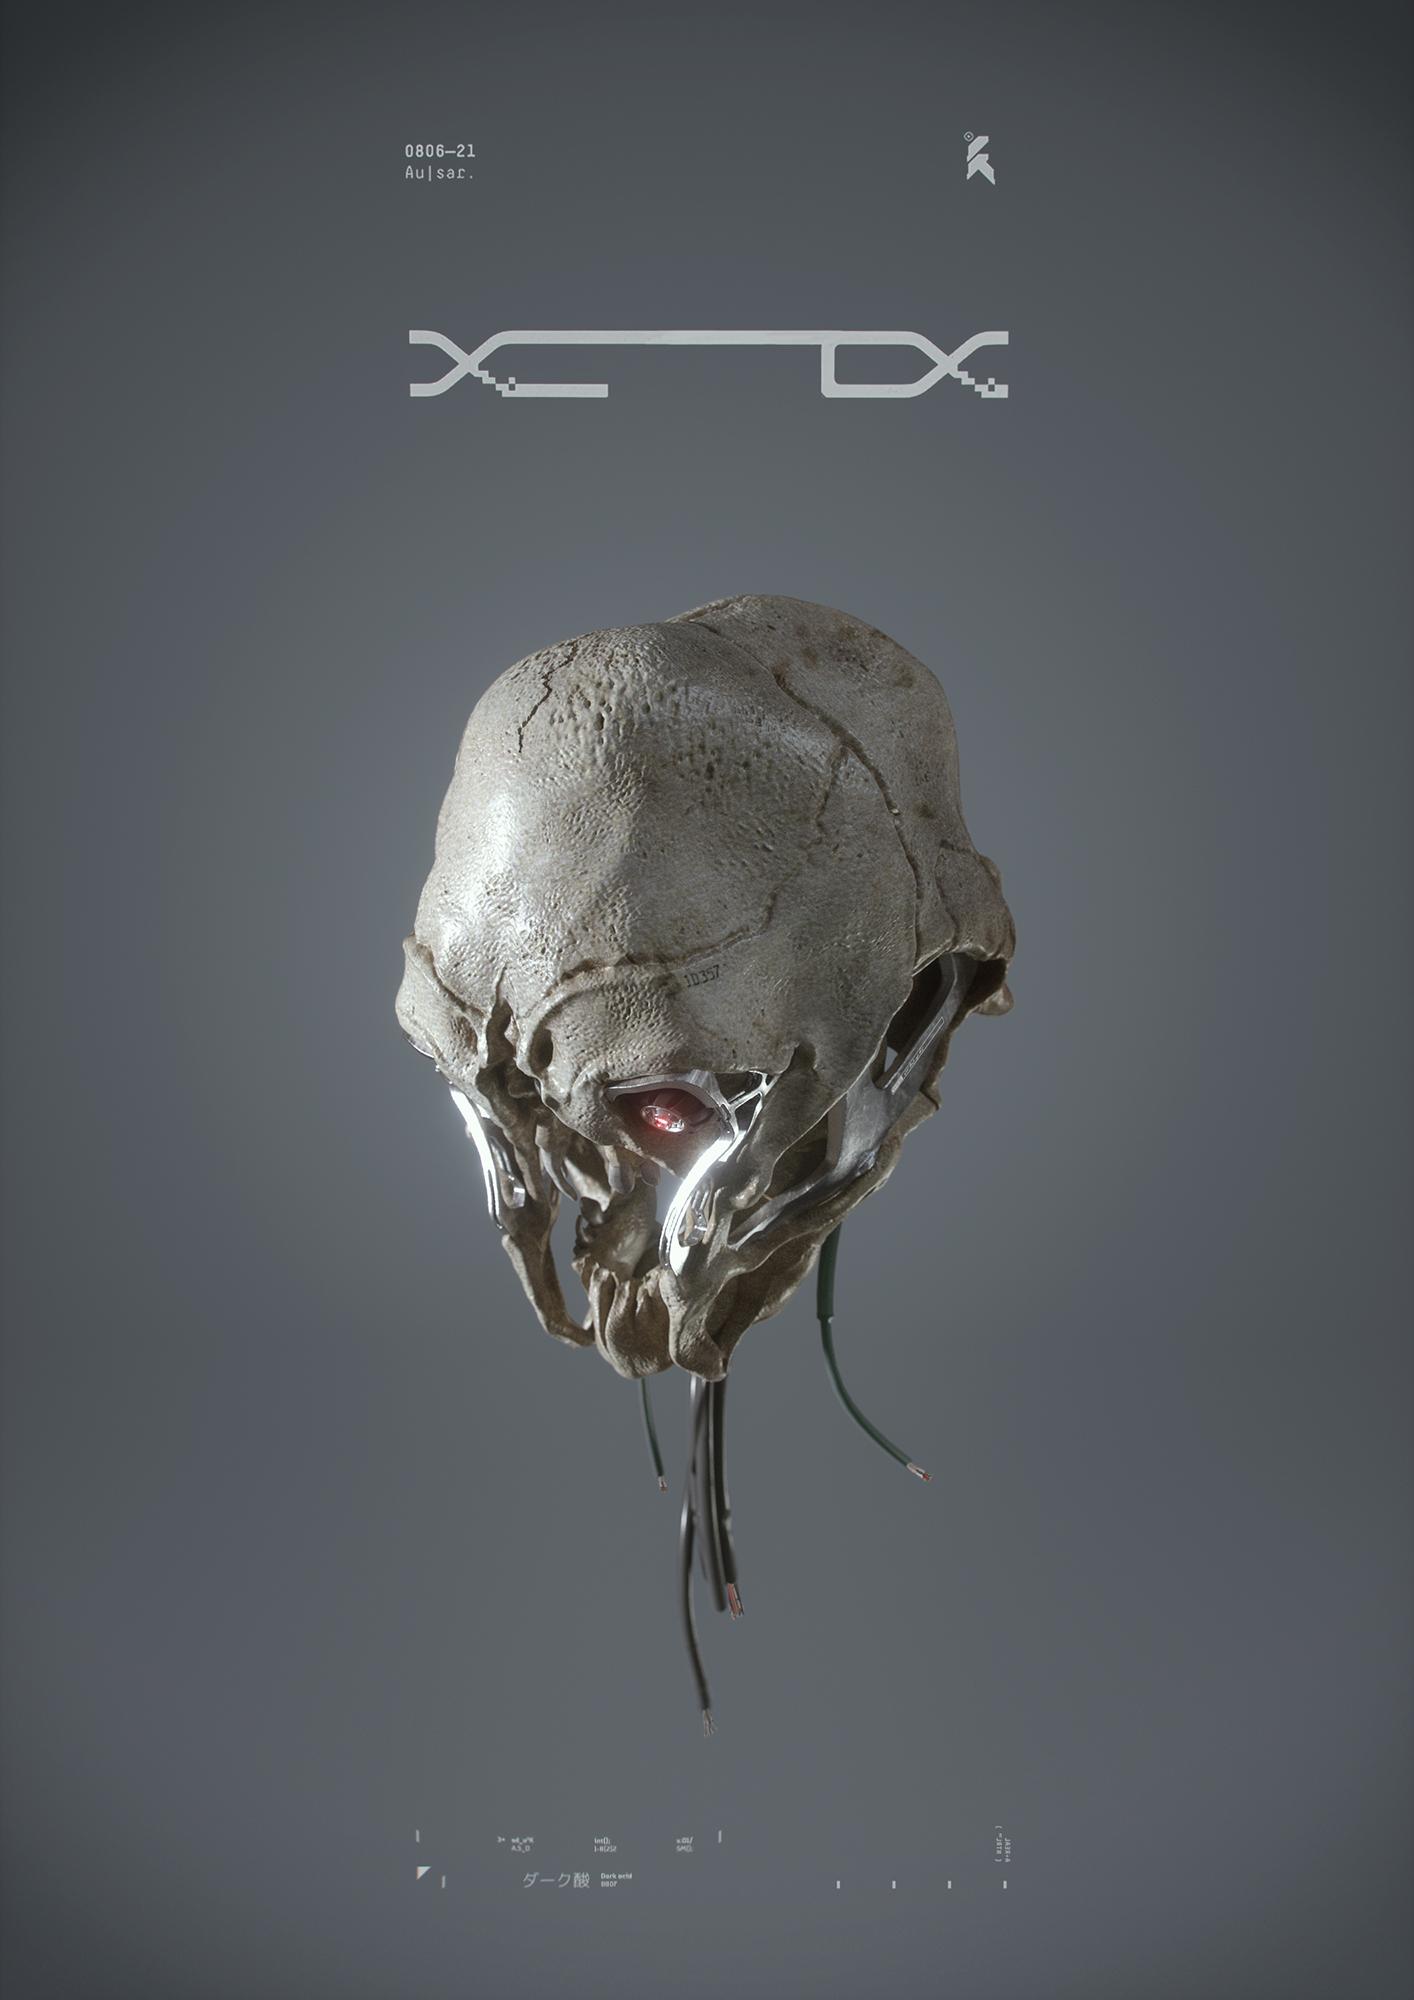 z01_sword_skull_last_inside_new_light0000